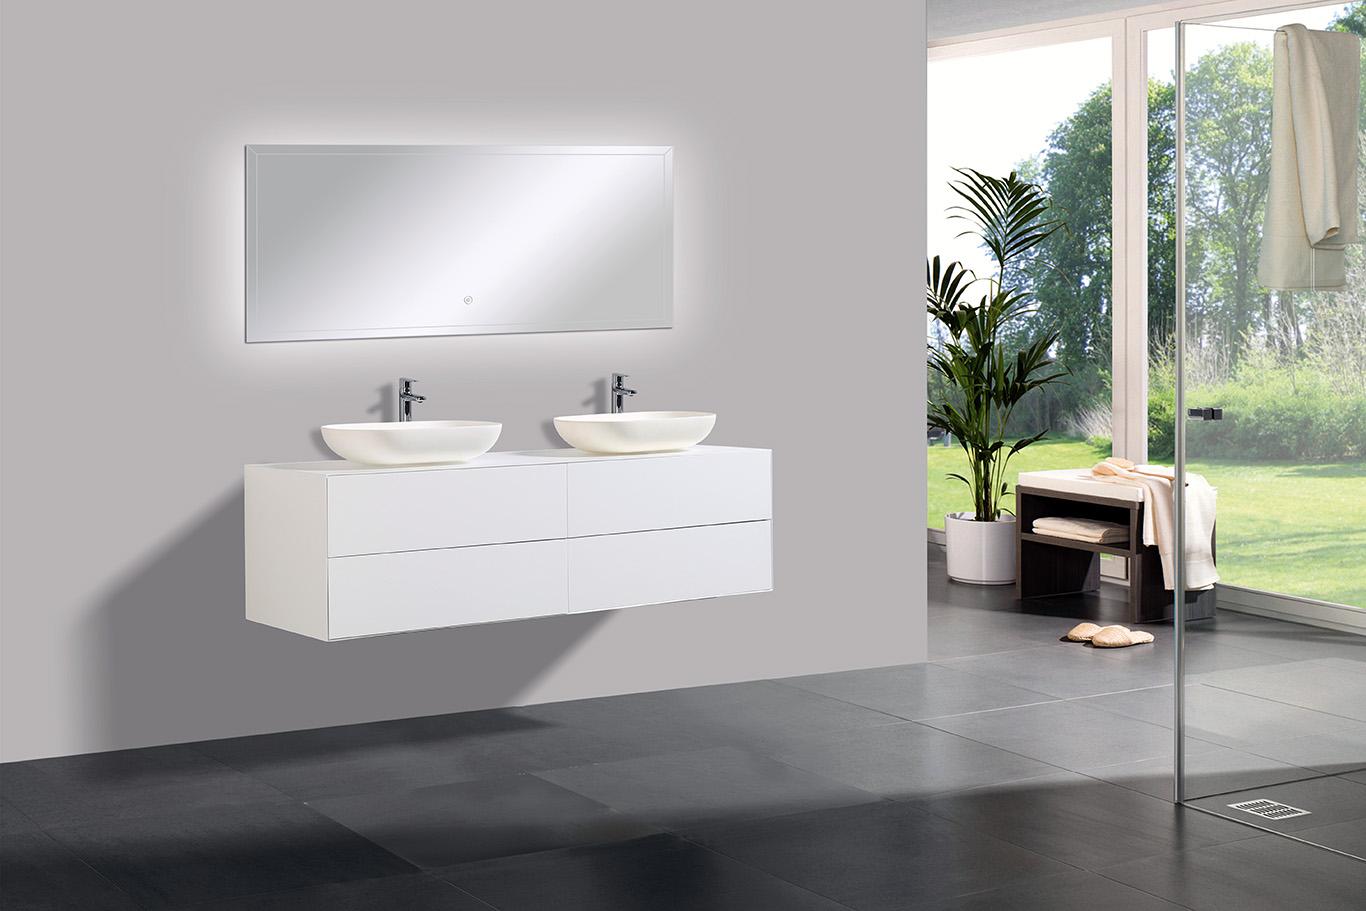 Mobili Arredo Bagno Bianco : Fantastico arredo bagno ikea mobili da moderni e classici ikea